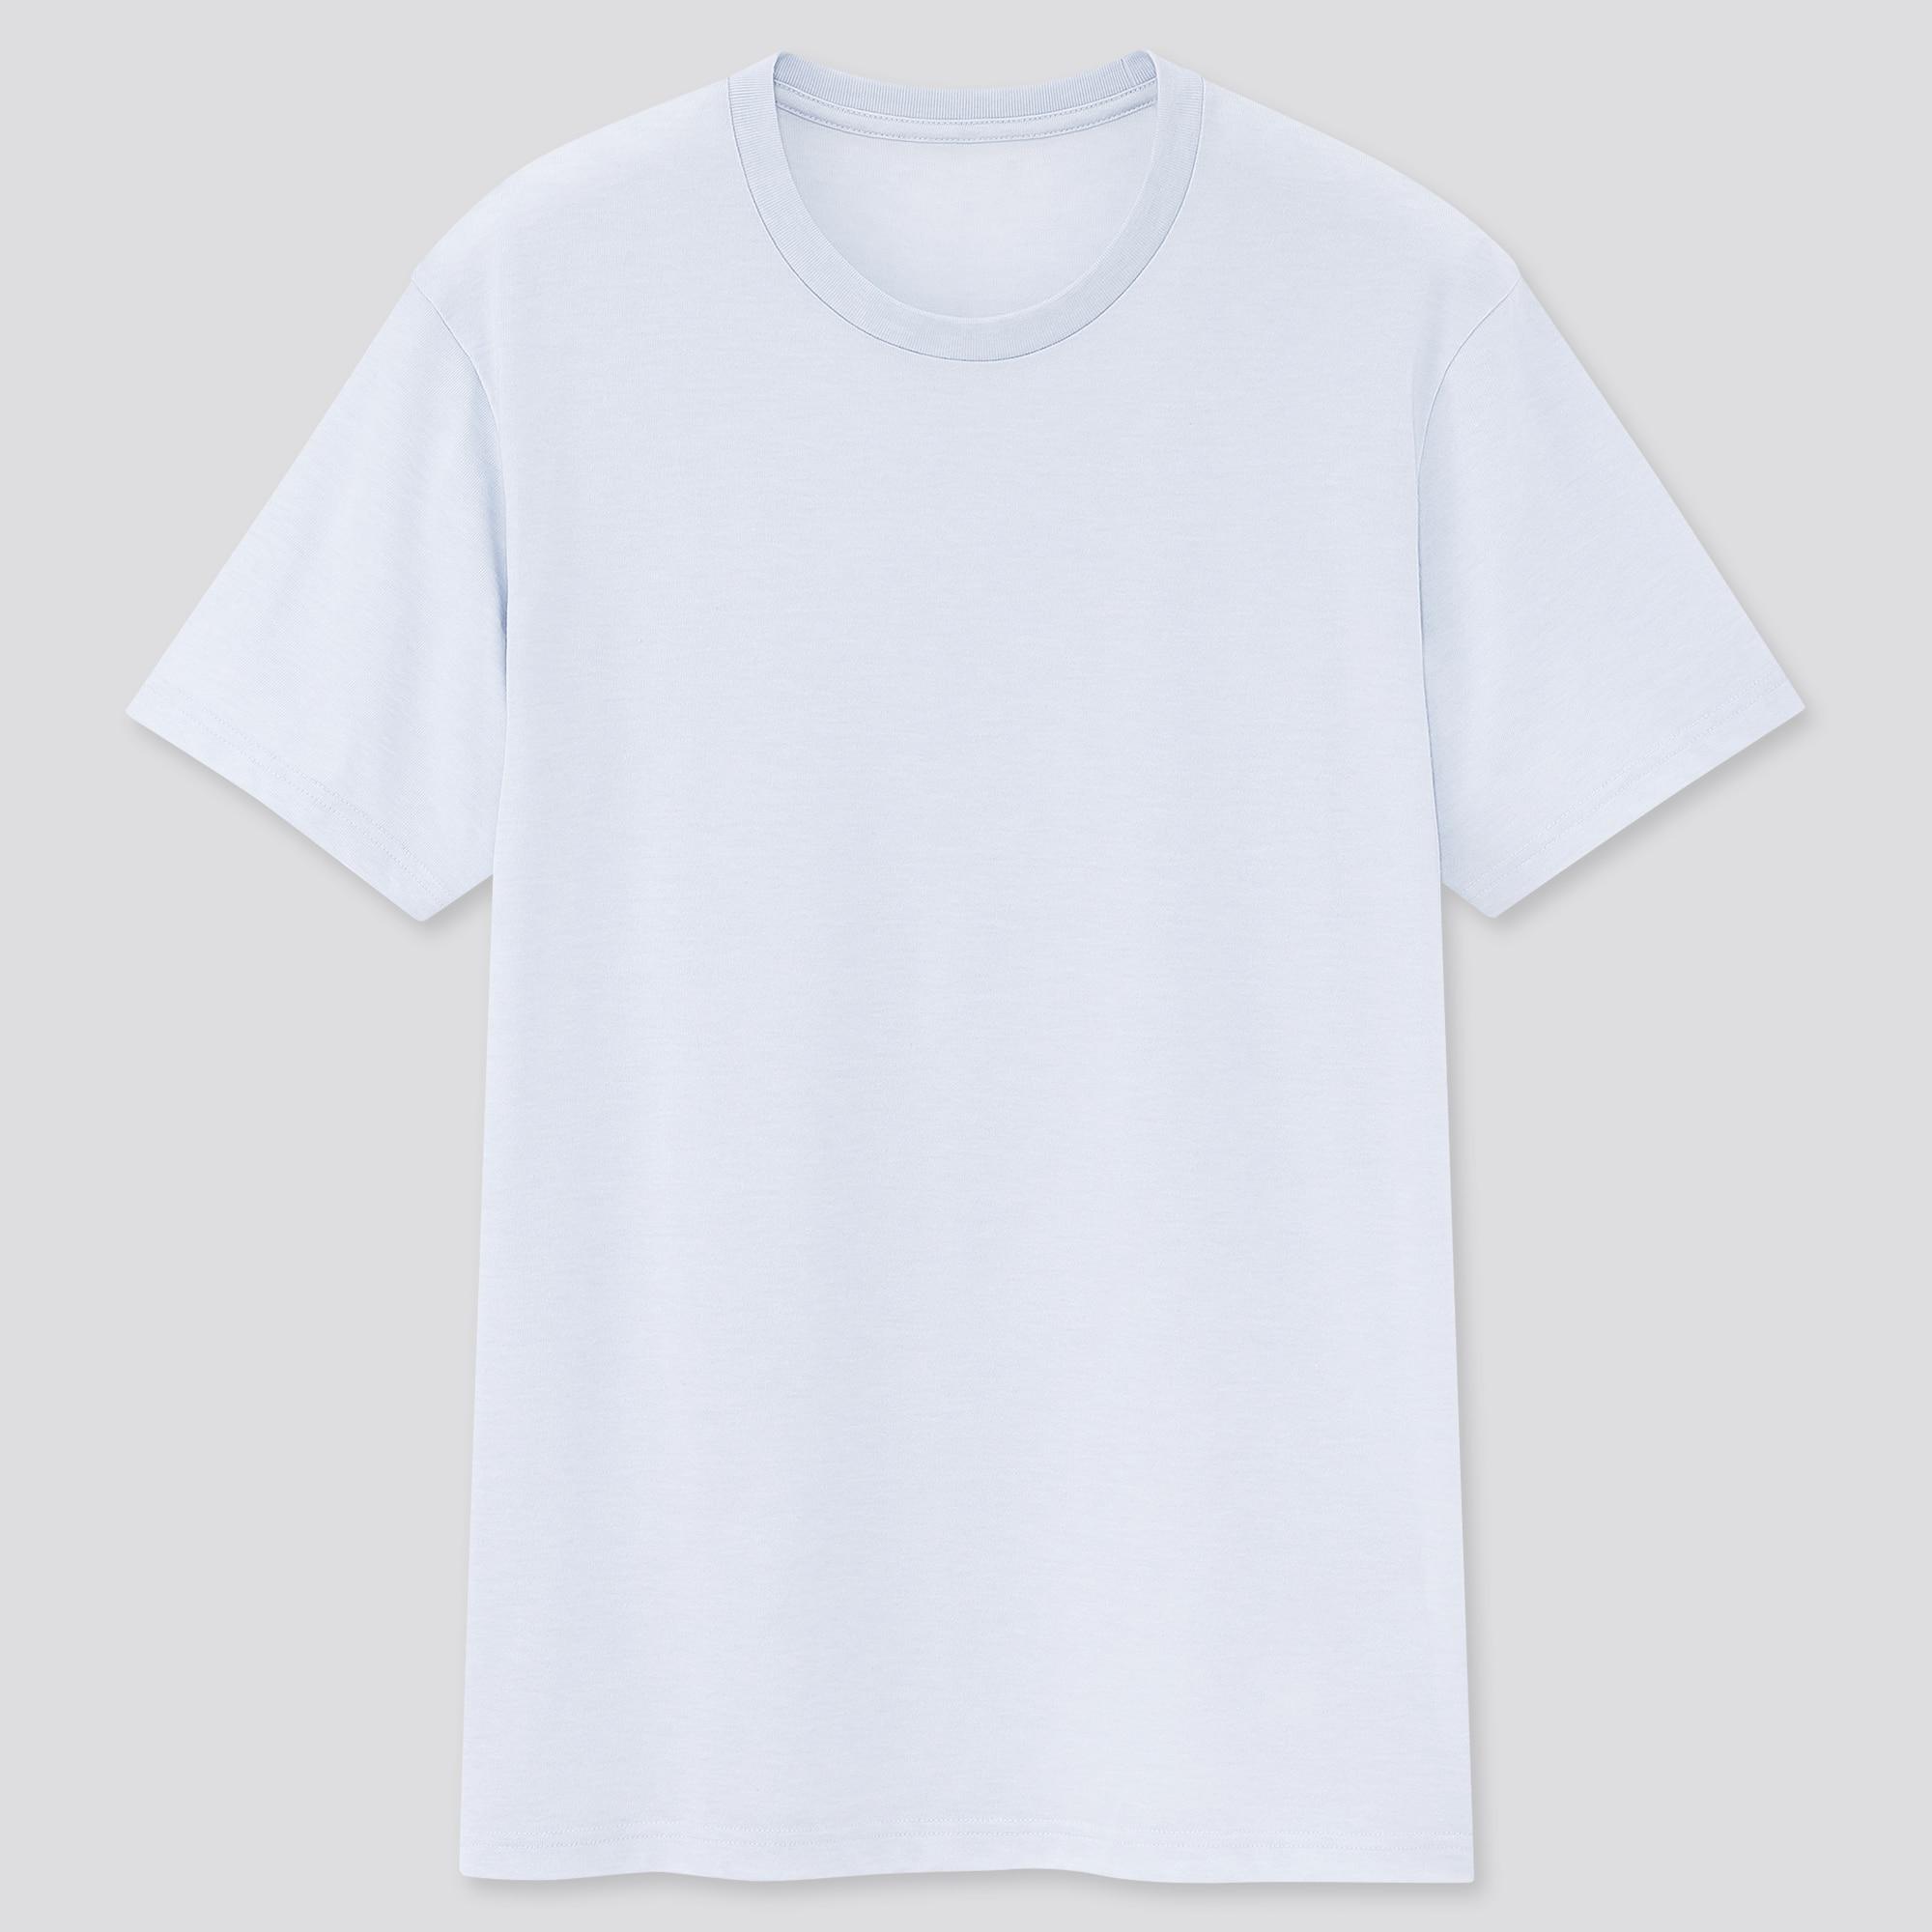 Uniqlo men dry crew neck short-sleeve color t-shirt